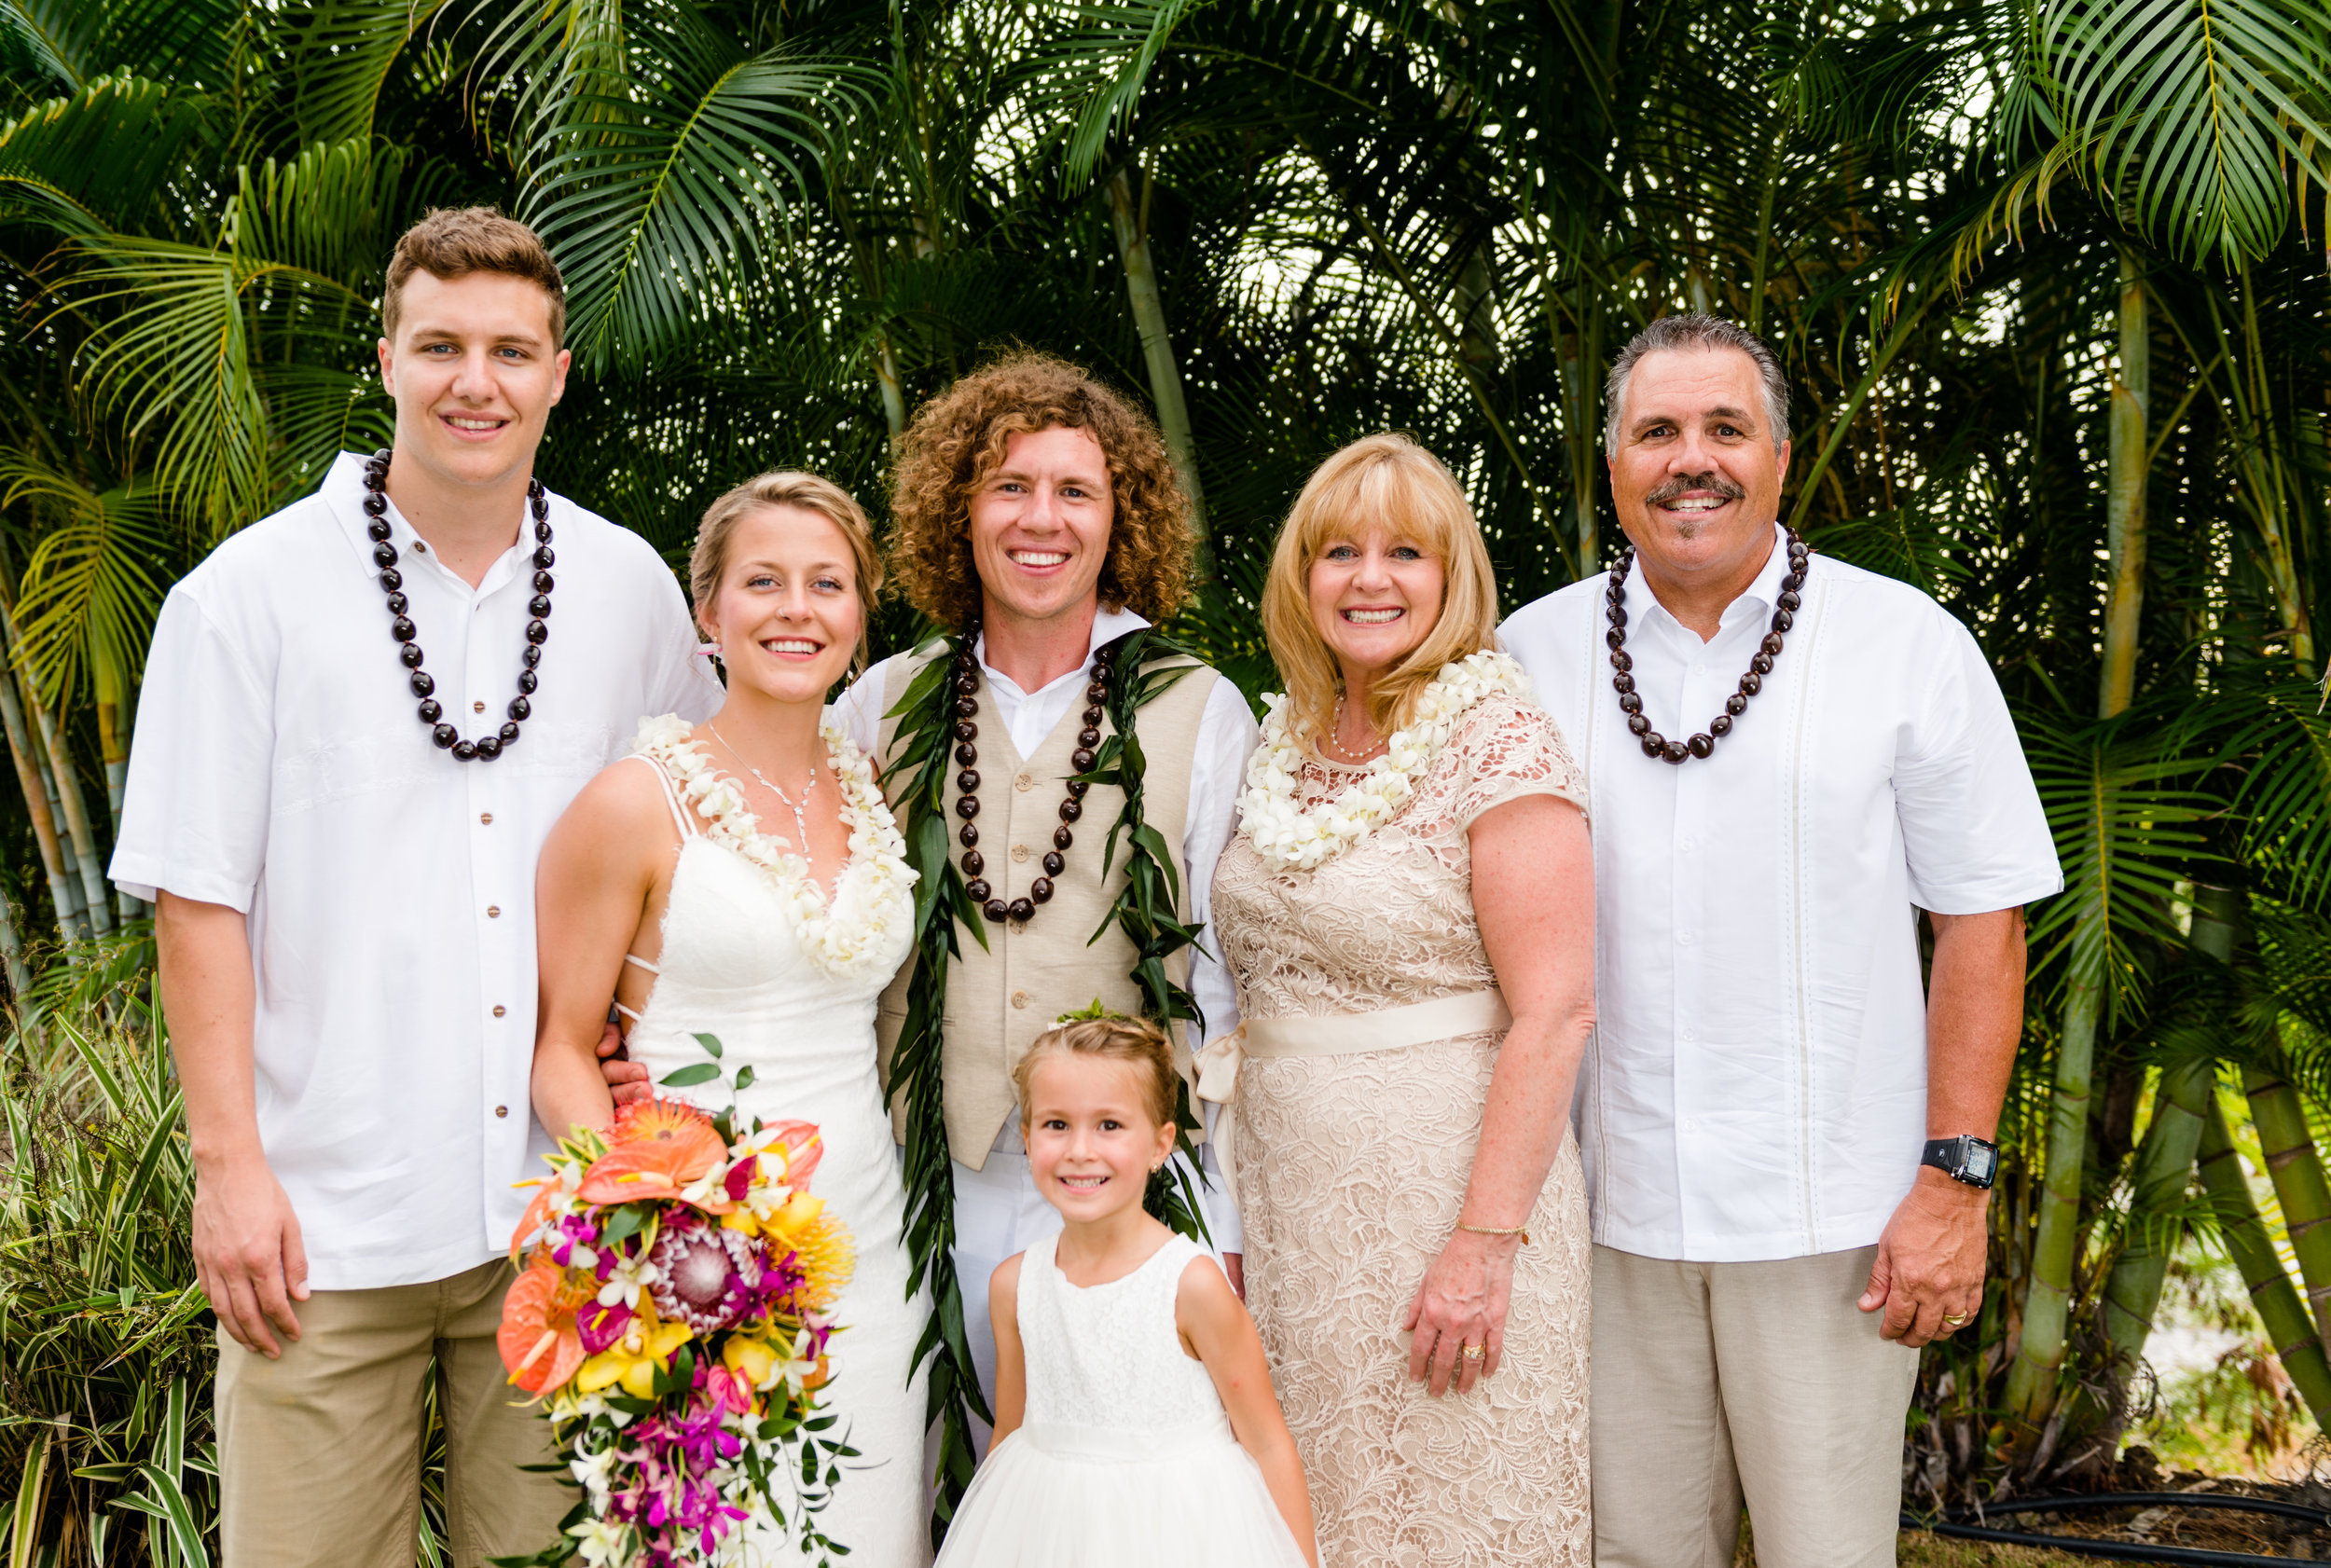 Orton Family Photo's_.jpg